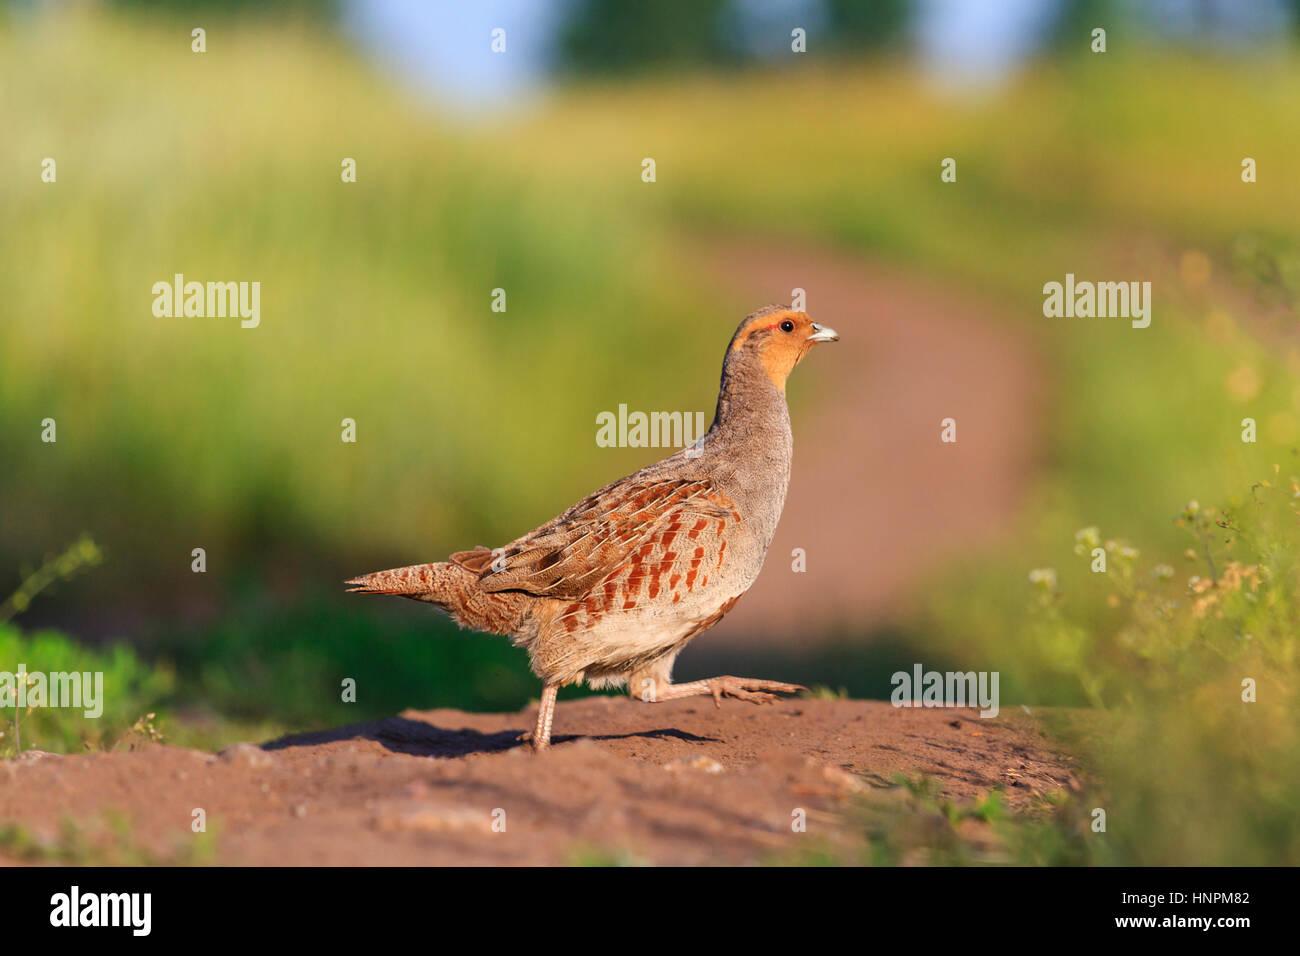 grey partridge road goes through the field,Season 2017, opening of hunting, wildlife, wild bird, - Stock Image